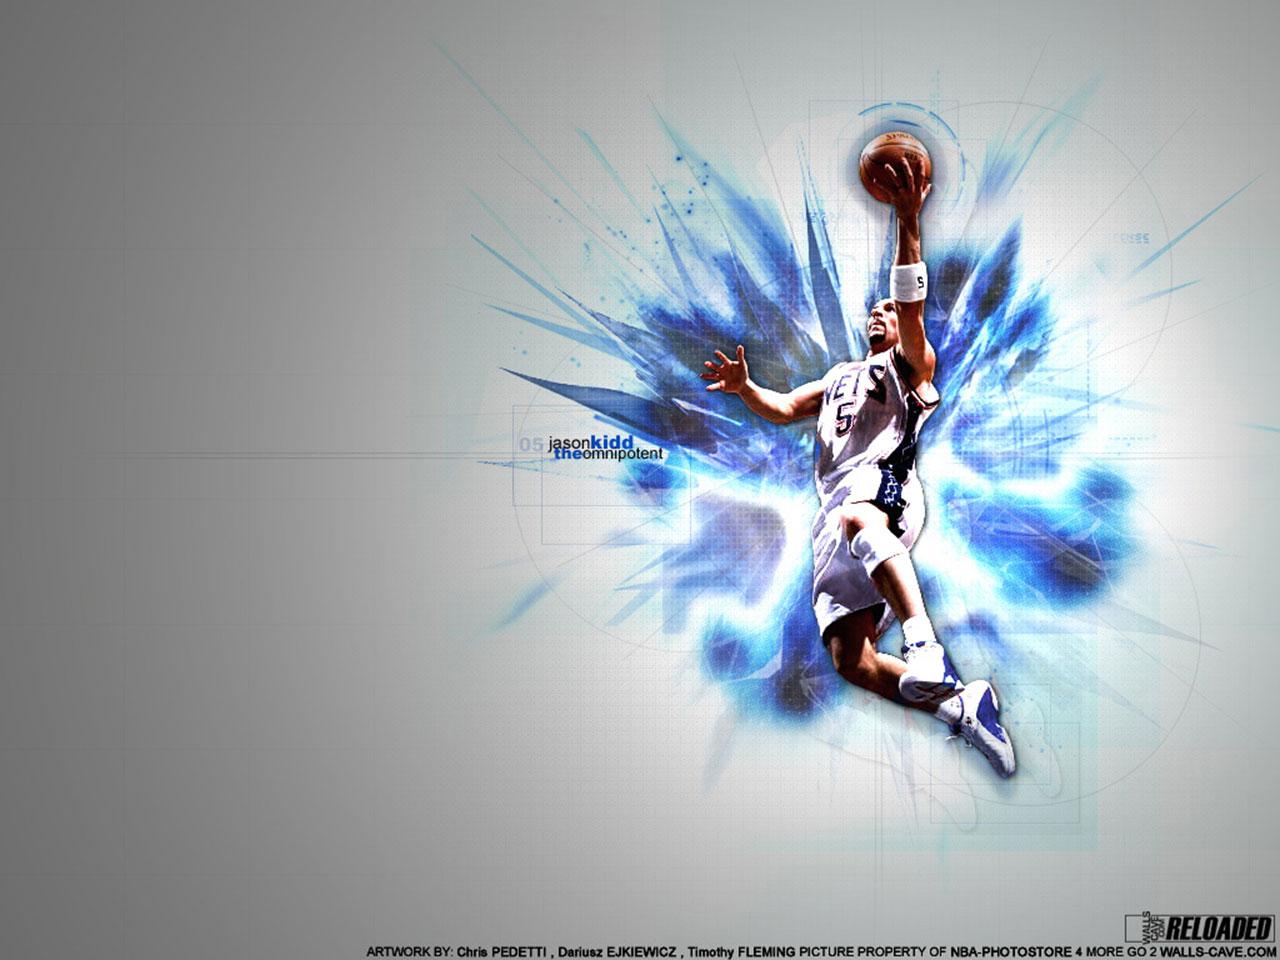 Jason kidd mavs 5 wallpaper basketball wallpapers at jason kidd mavs 5 wallpaper voltagebd Image collections